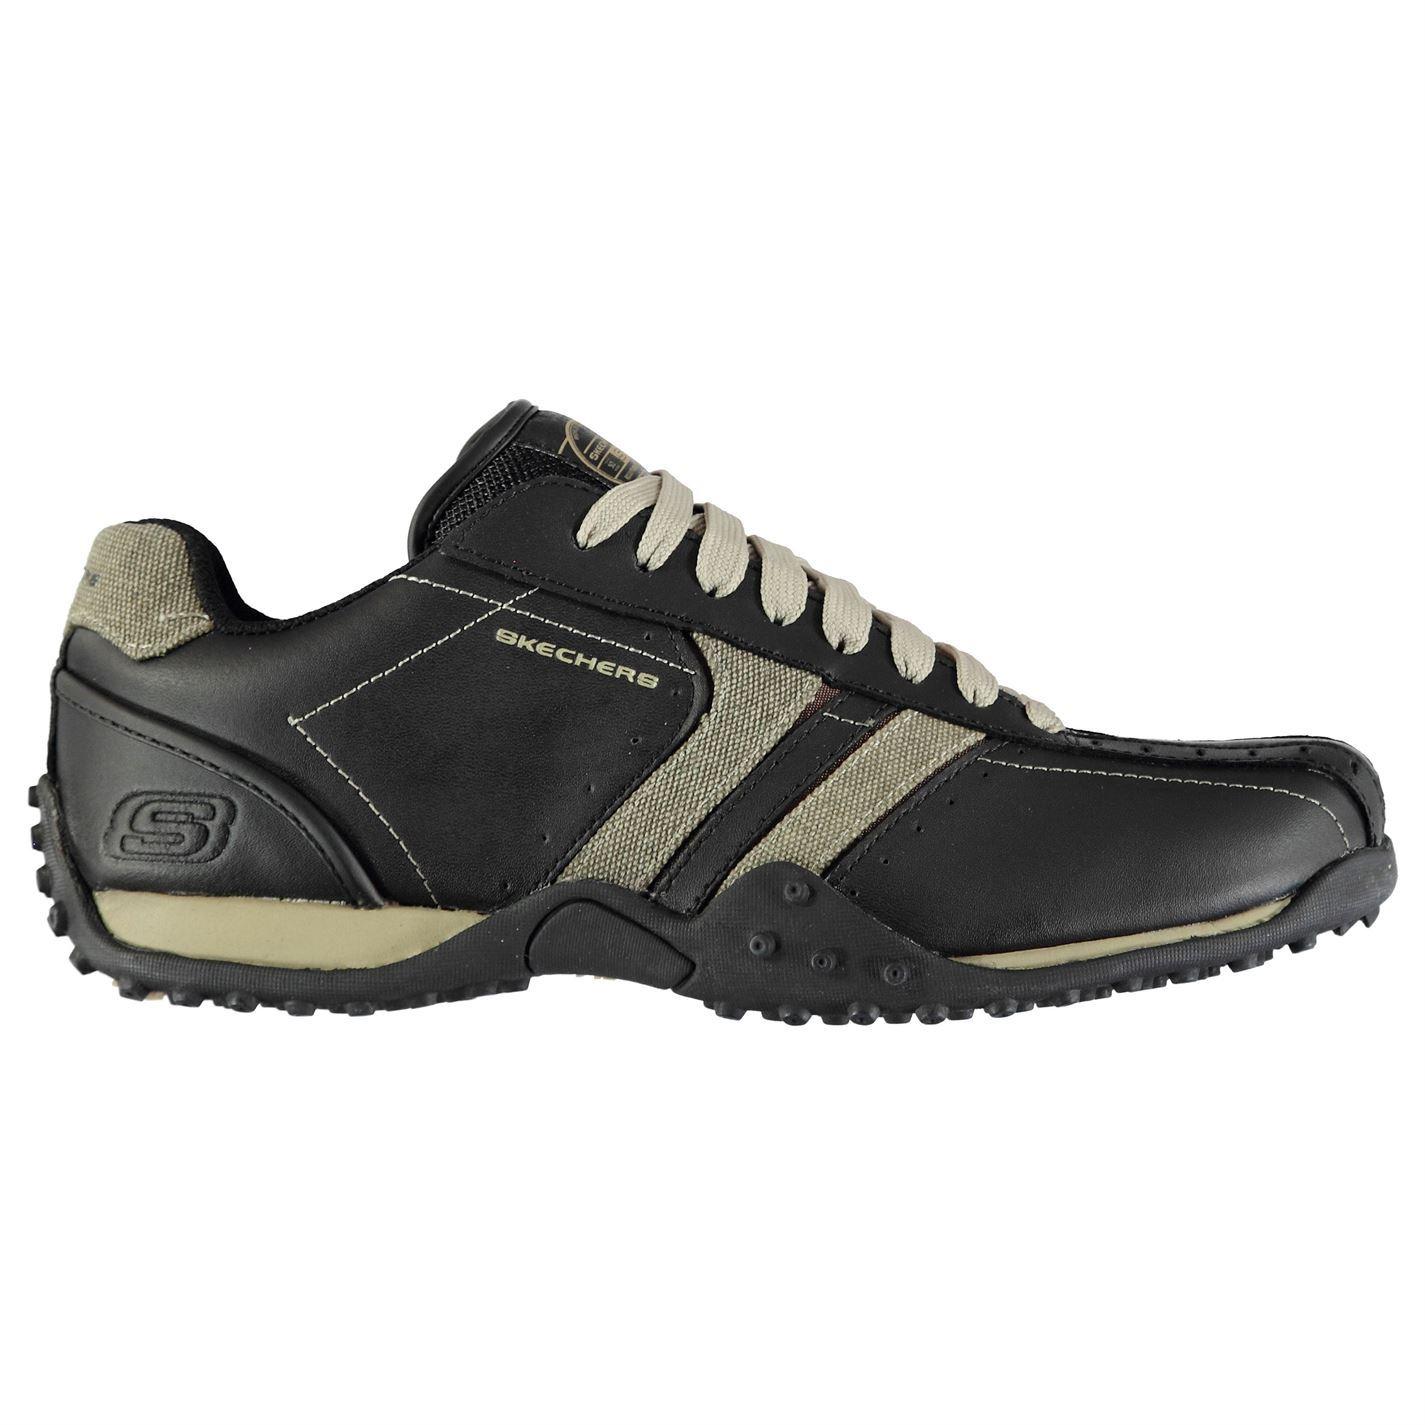 Skechers-Urban-Track-Forward-Trainers-Mens-Athleisure-Footwear-Shoes-Sneakers thumbnail 3